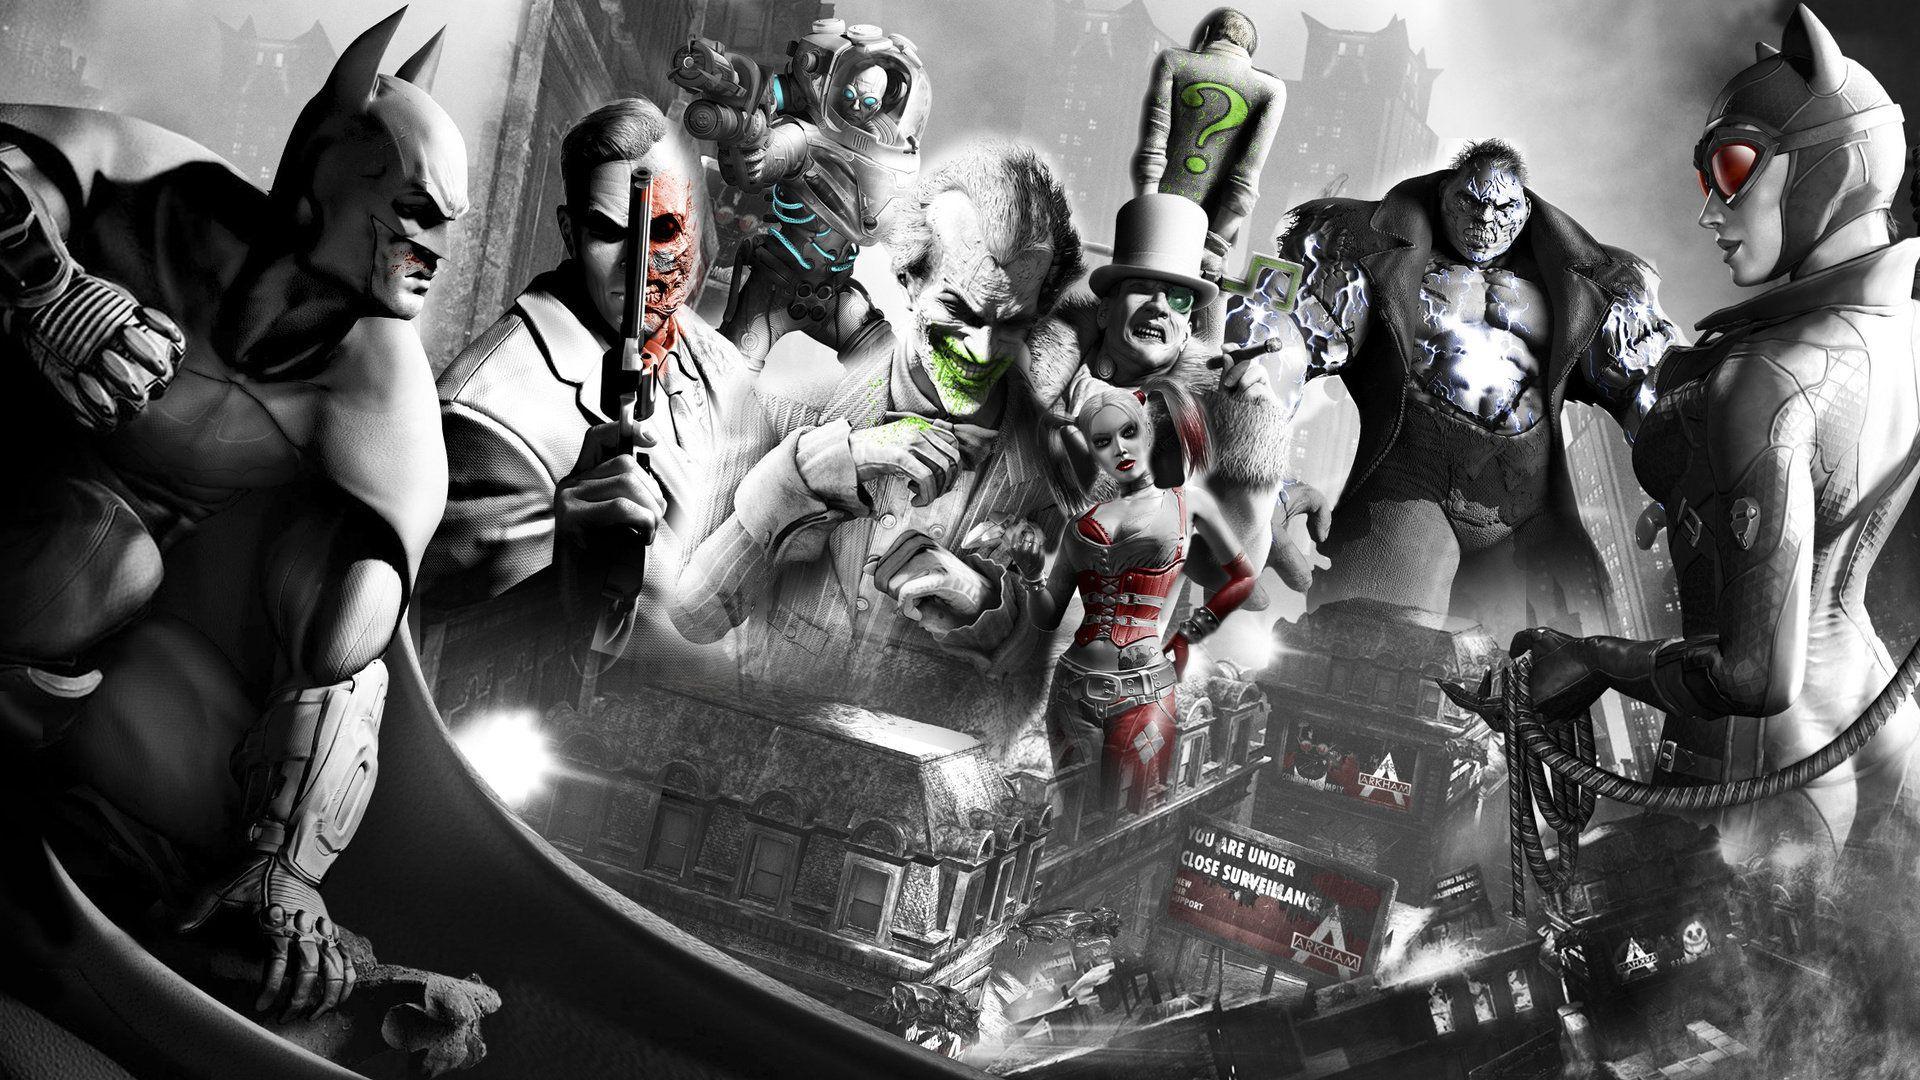 High Def Gaming Backgrounds For Your Computer Desktop Performance Psu Http Www Performancepsu Com Batman Arkham City Arkham City Joker Wallpapers